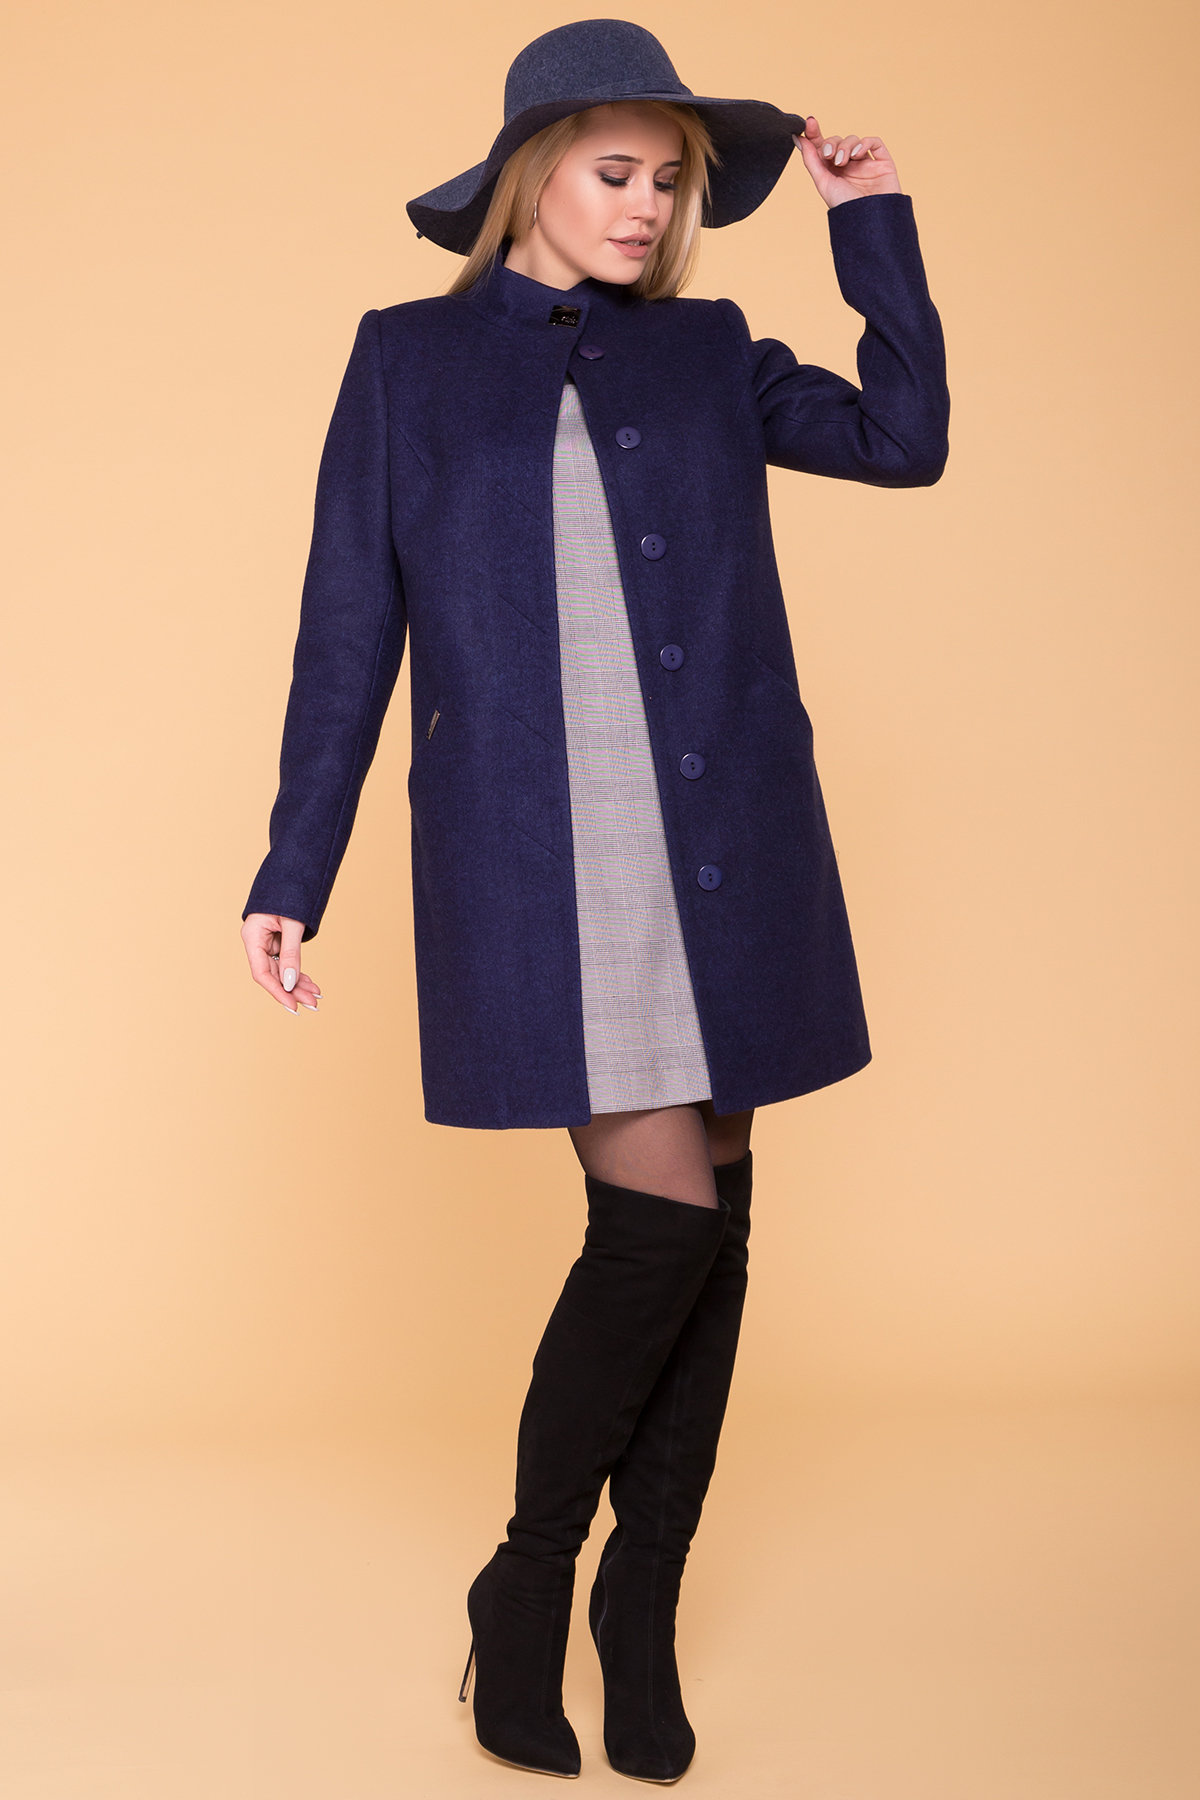 Пальто Сплит 4374 АРТ. 37660 Цвет: Темно-синий 17 - фото 3, интернет магазин tm-modus.ru